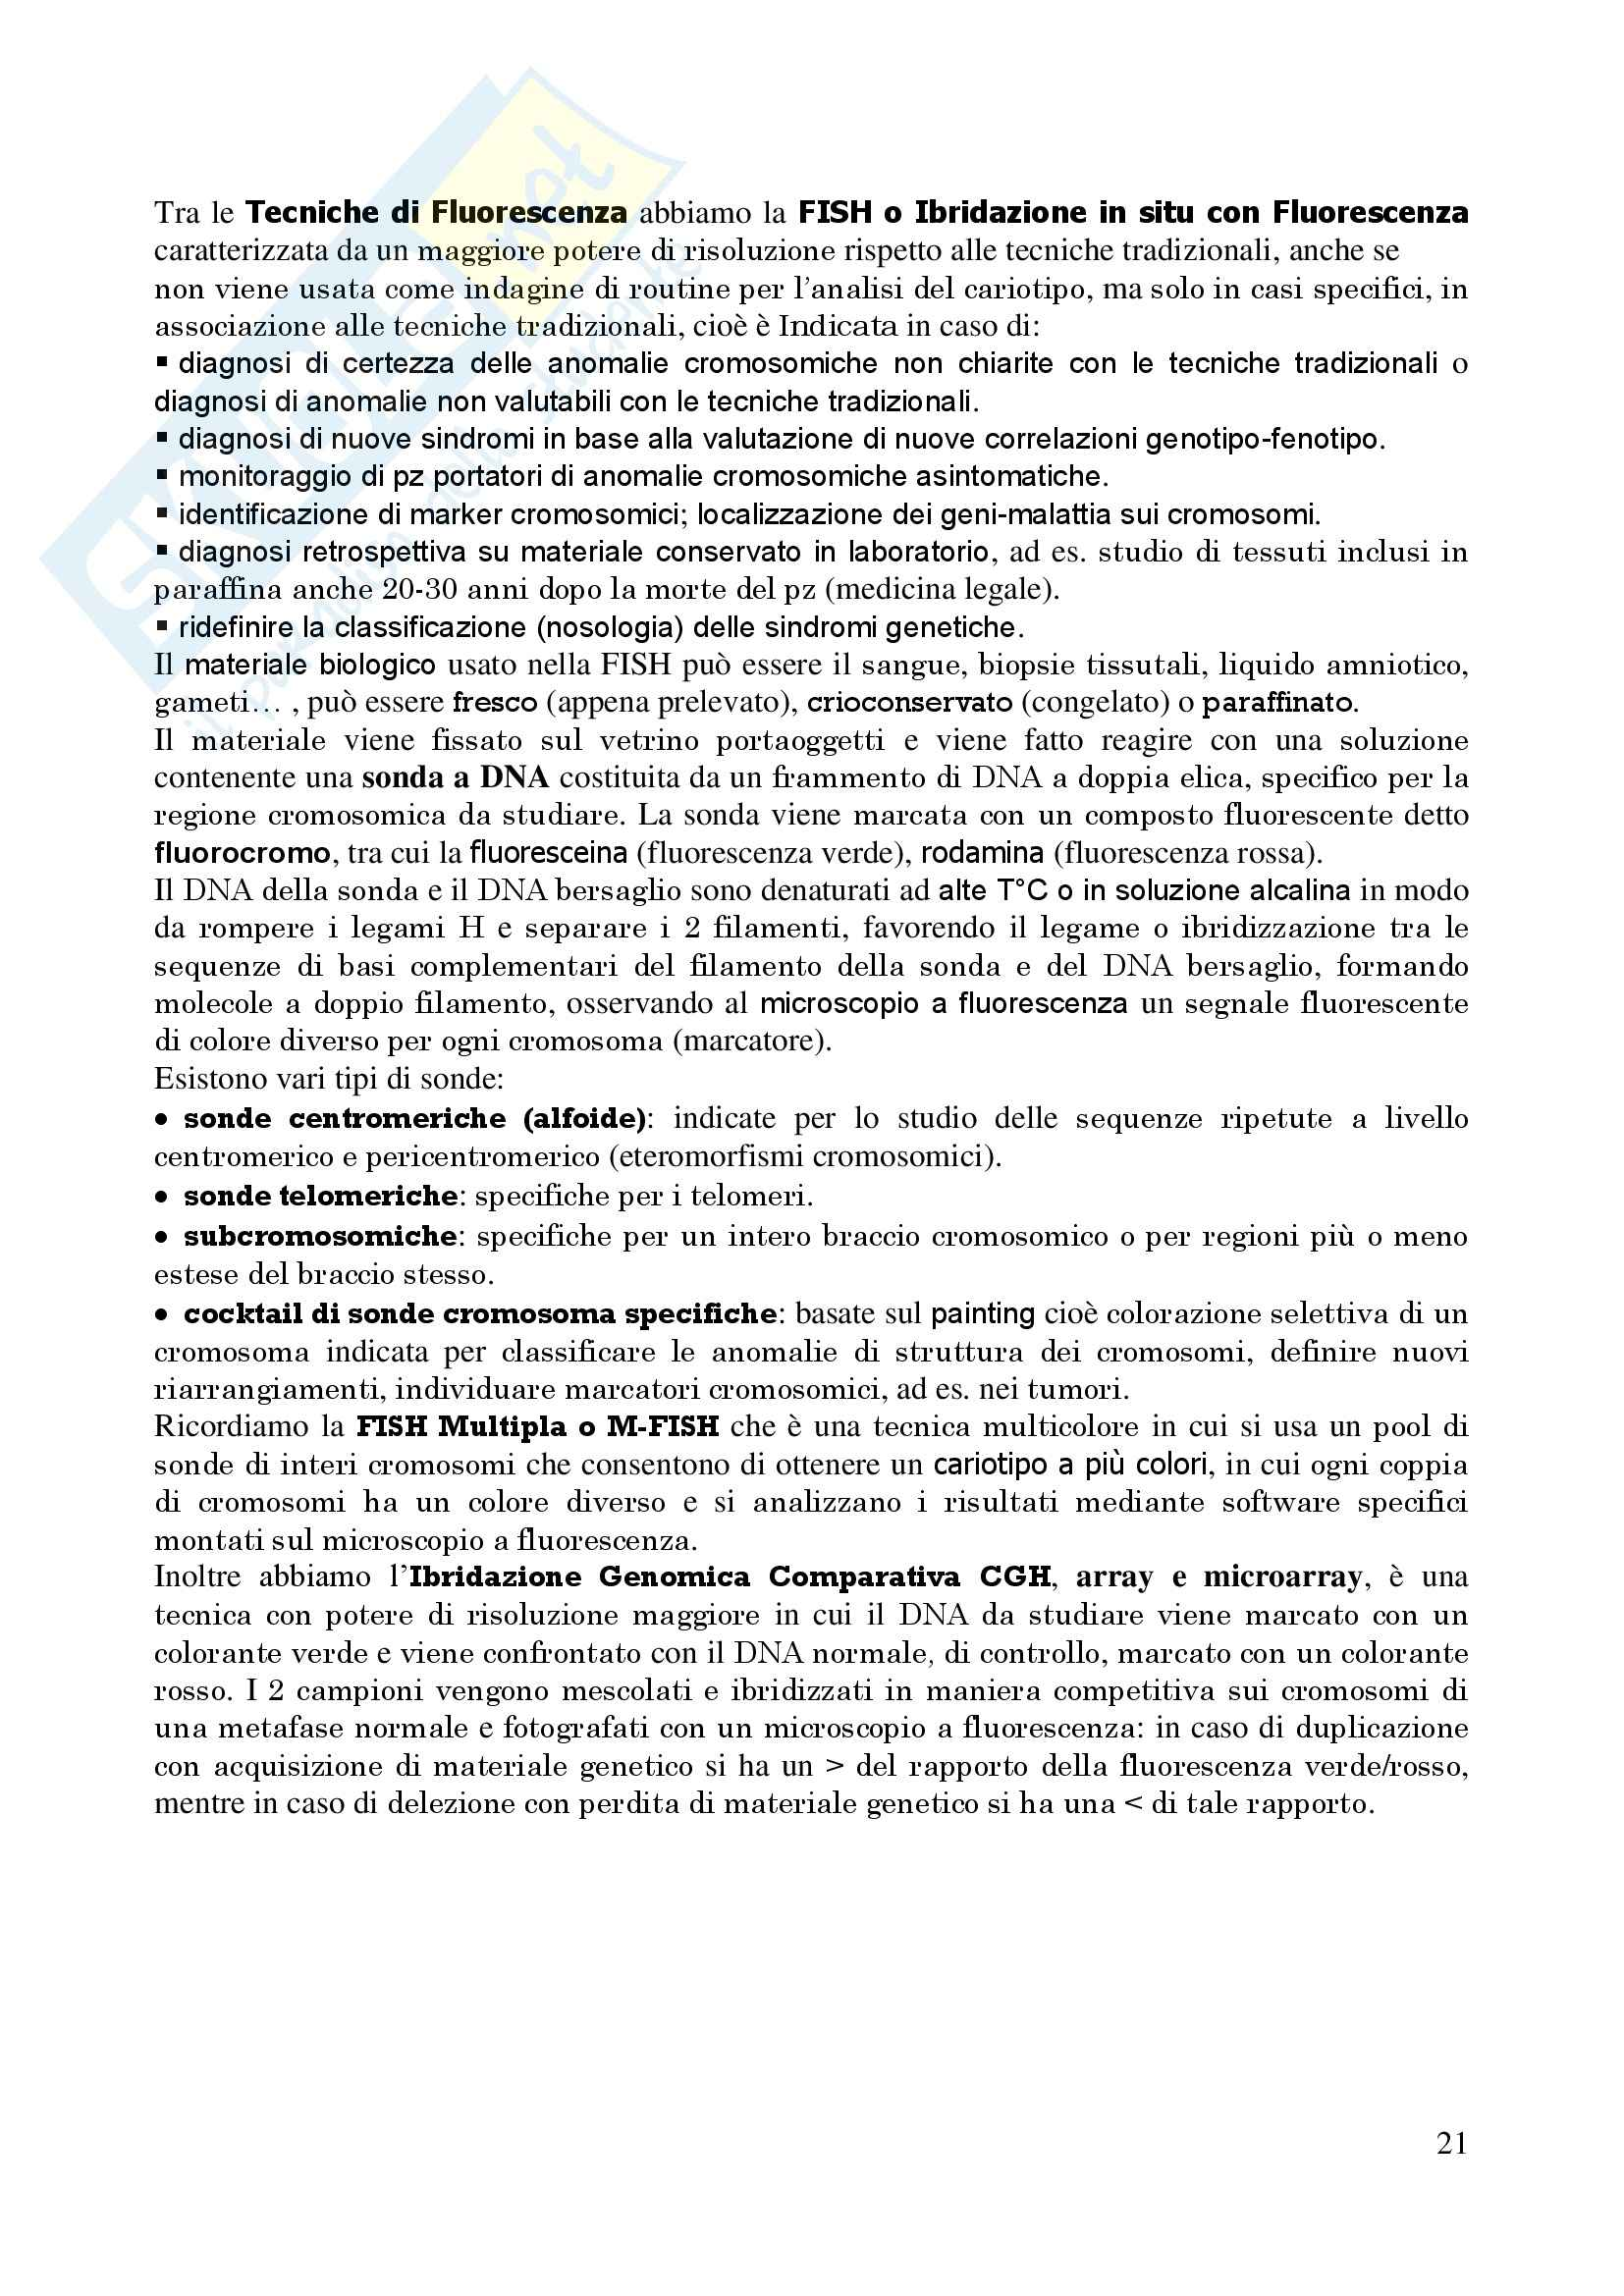 Genetica Umana - Appunti Pag. 21